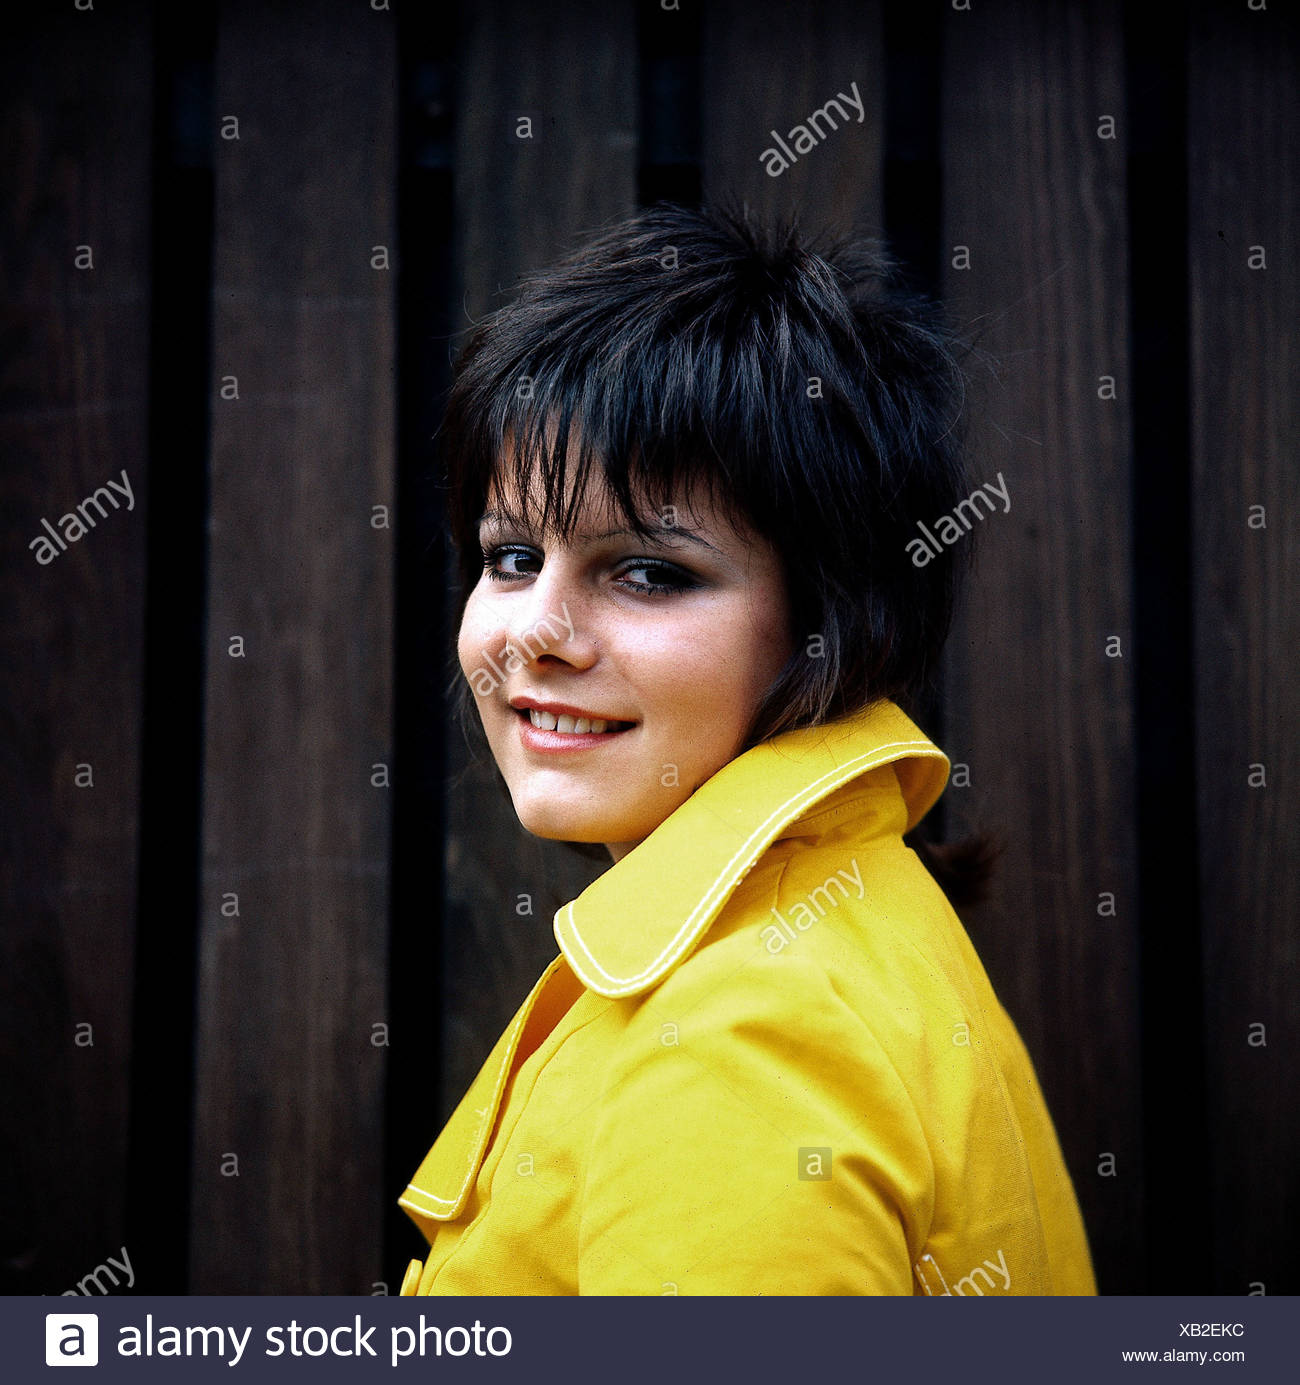 Rosenberg, Marianne, * 10.3.1955, deutsche Sängerin, Porträt, Lächeln, 1972 Stockbild